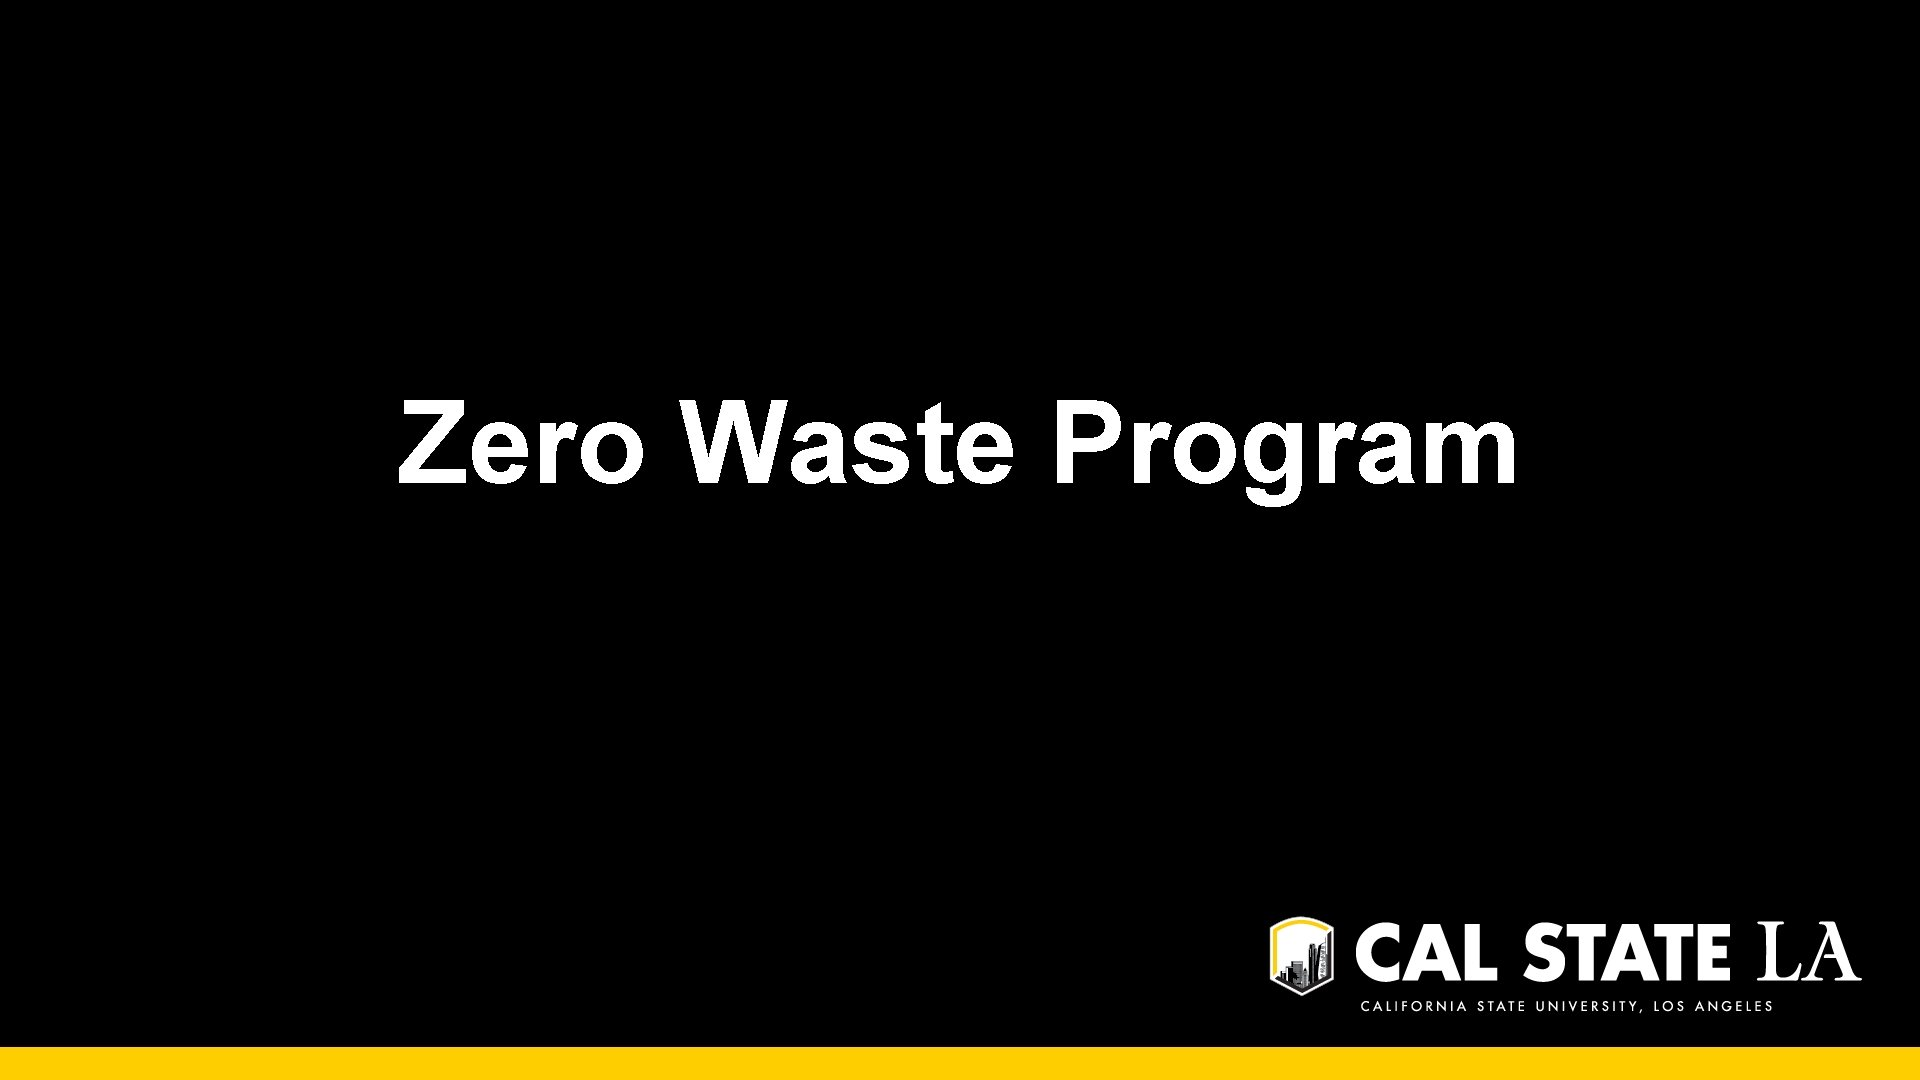 Zero Waste Program